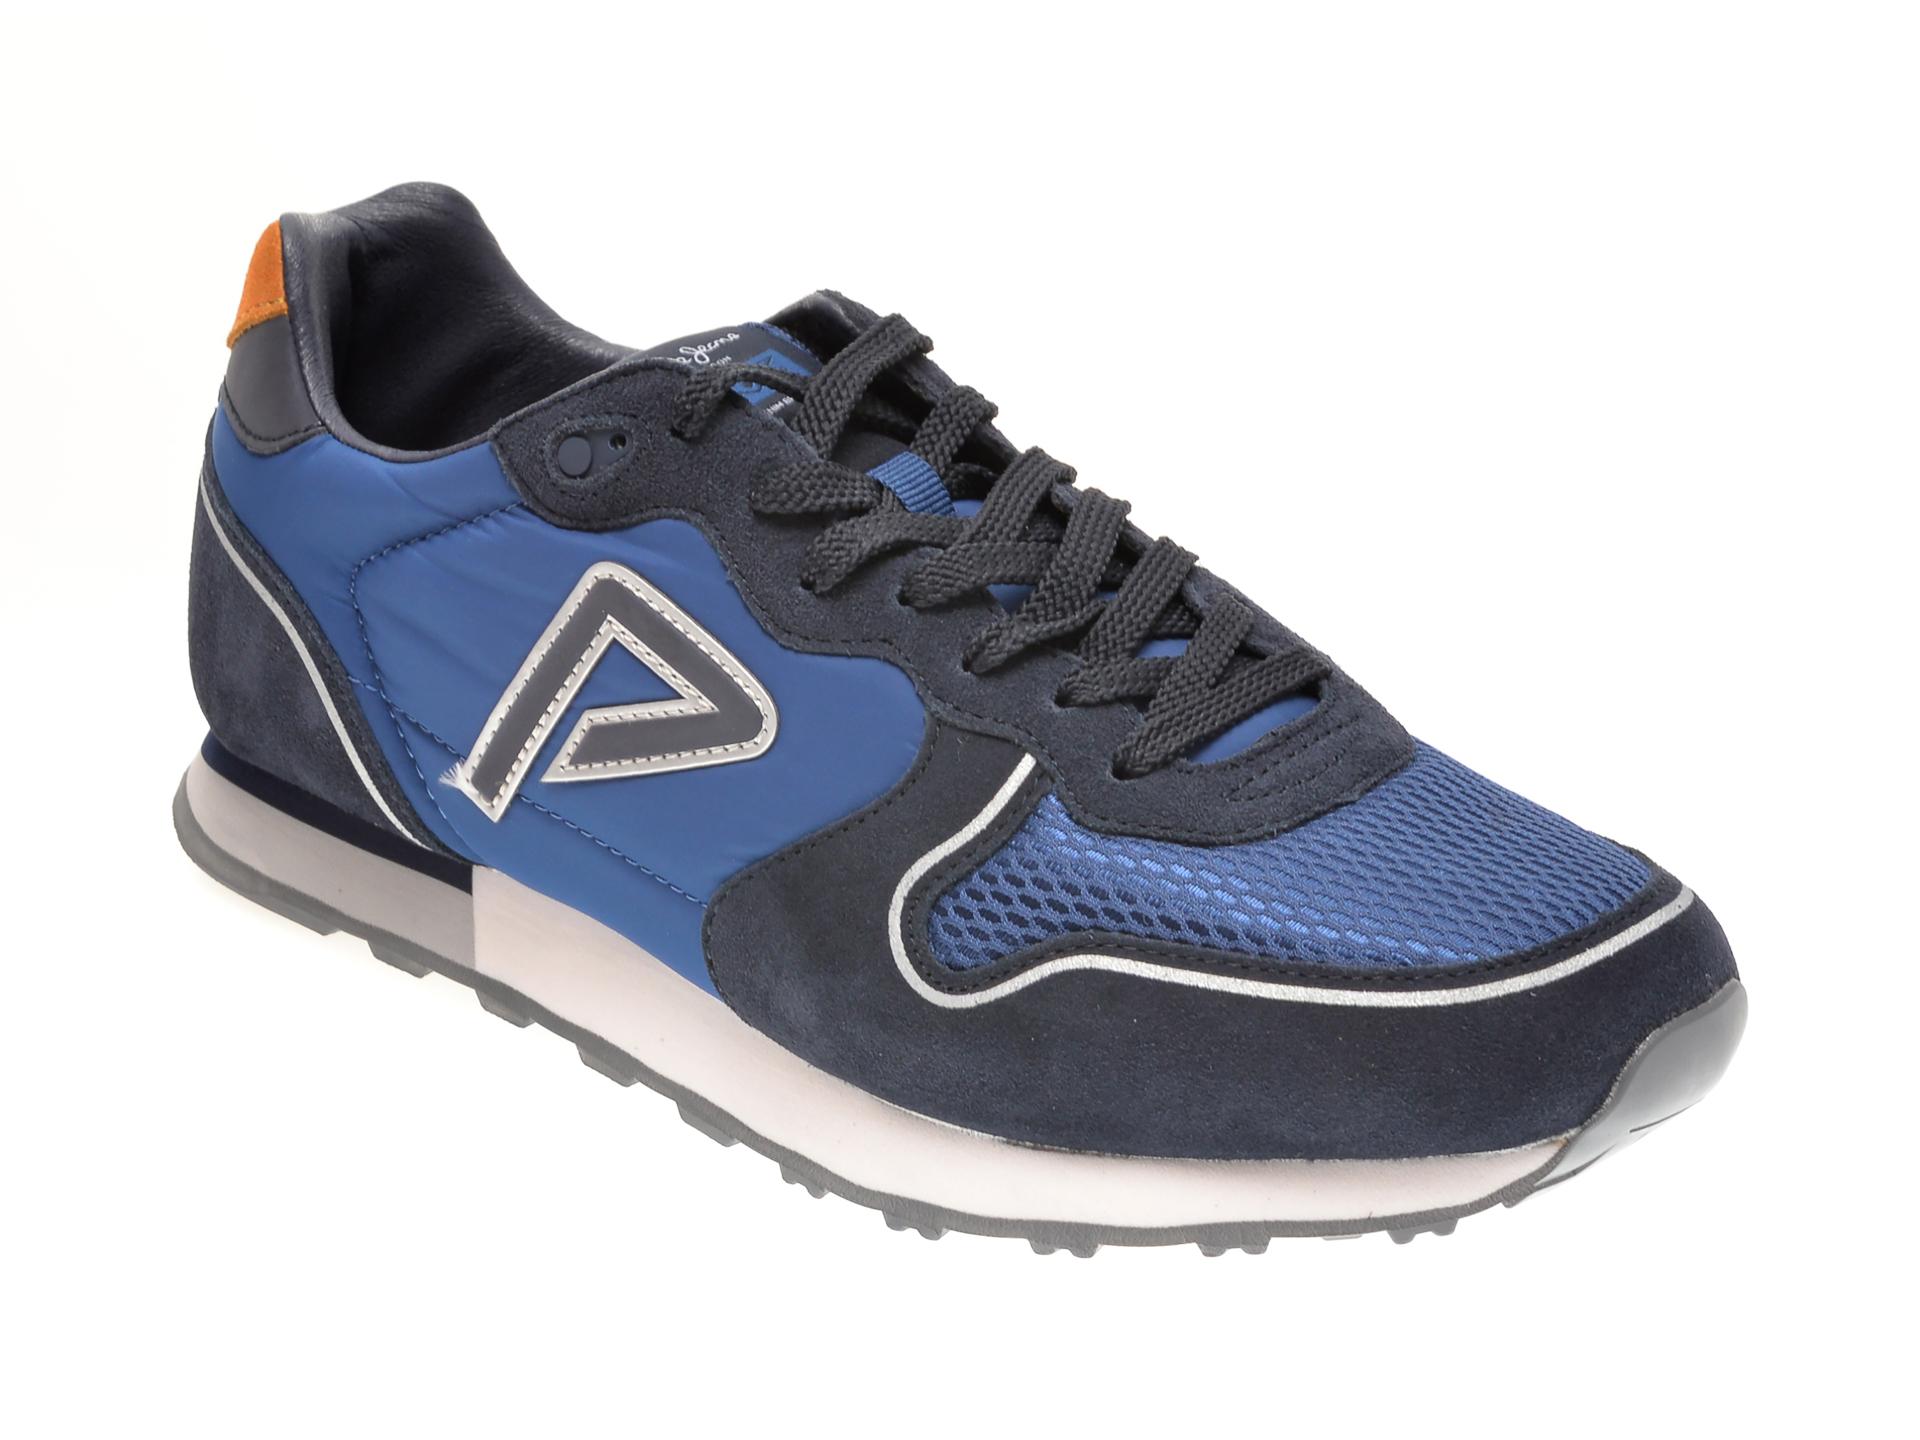 Pantofi sport PEPE JEANS albastri, MS30681, din material textil